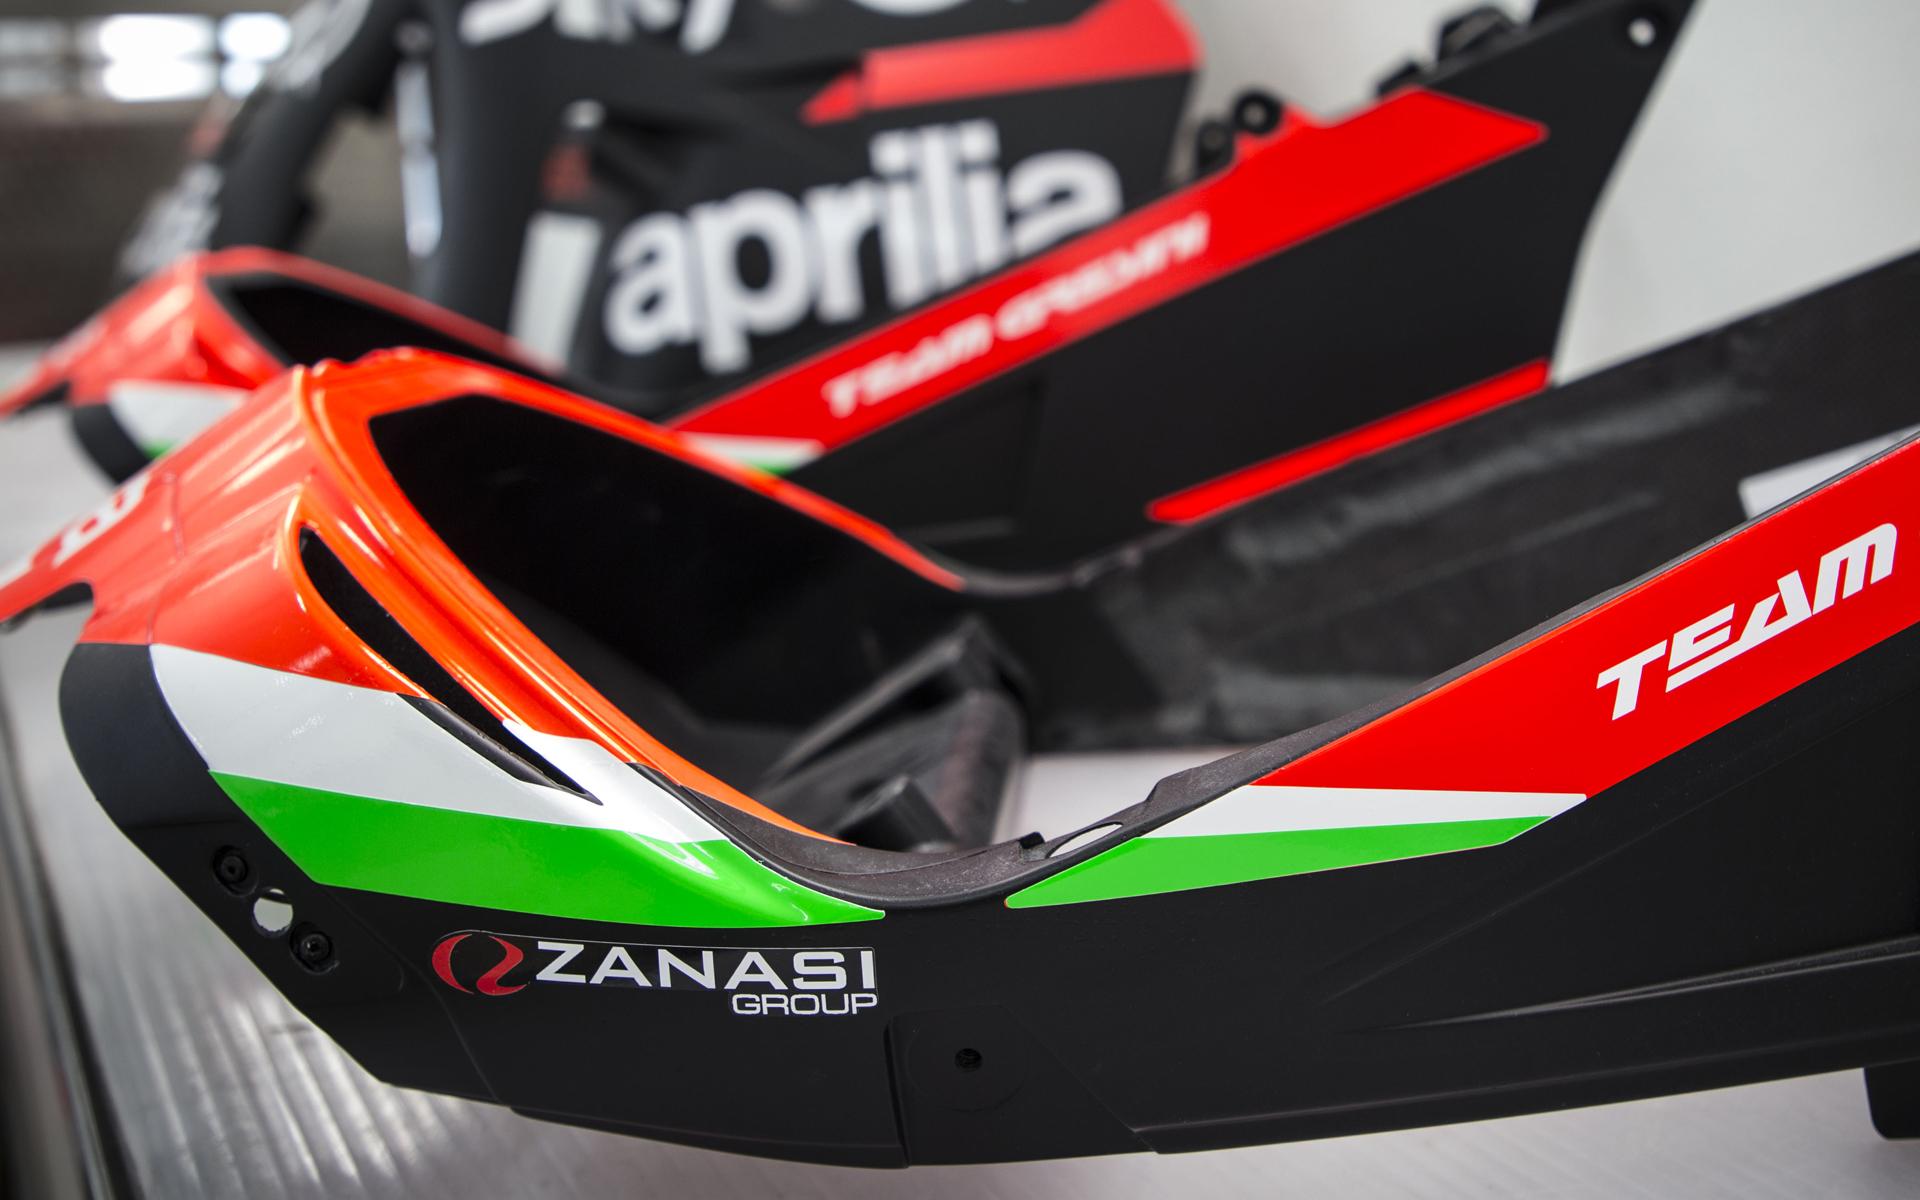 Carrozzeria Zanasi - Ferrari Service